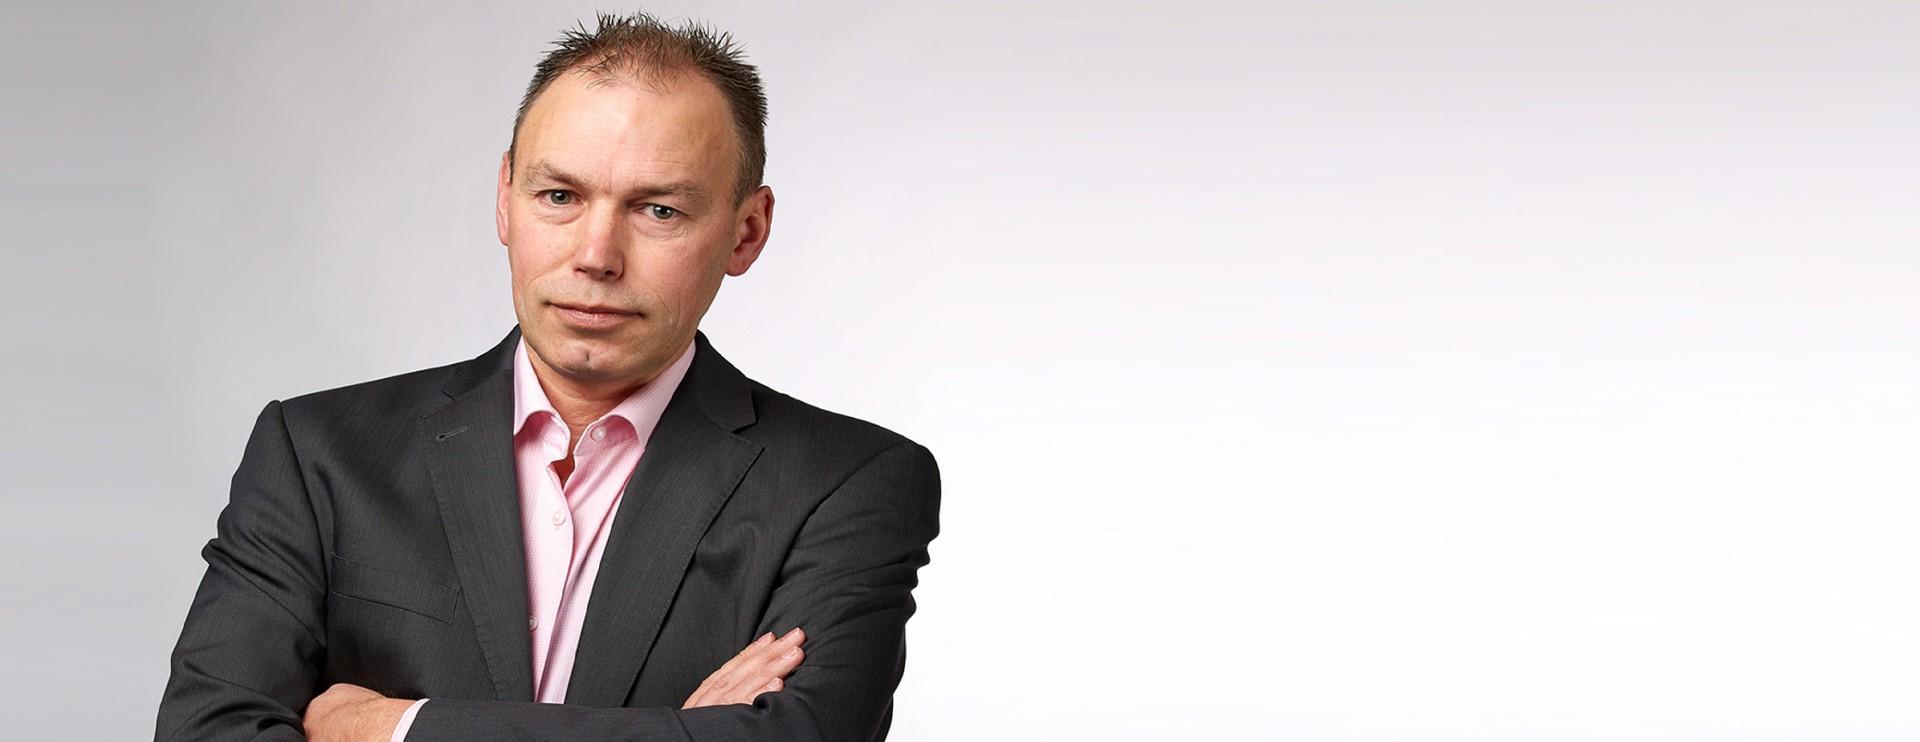 Jan Achterveld from VodafoneZiggo